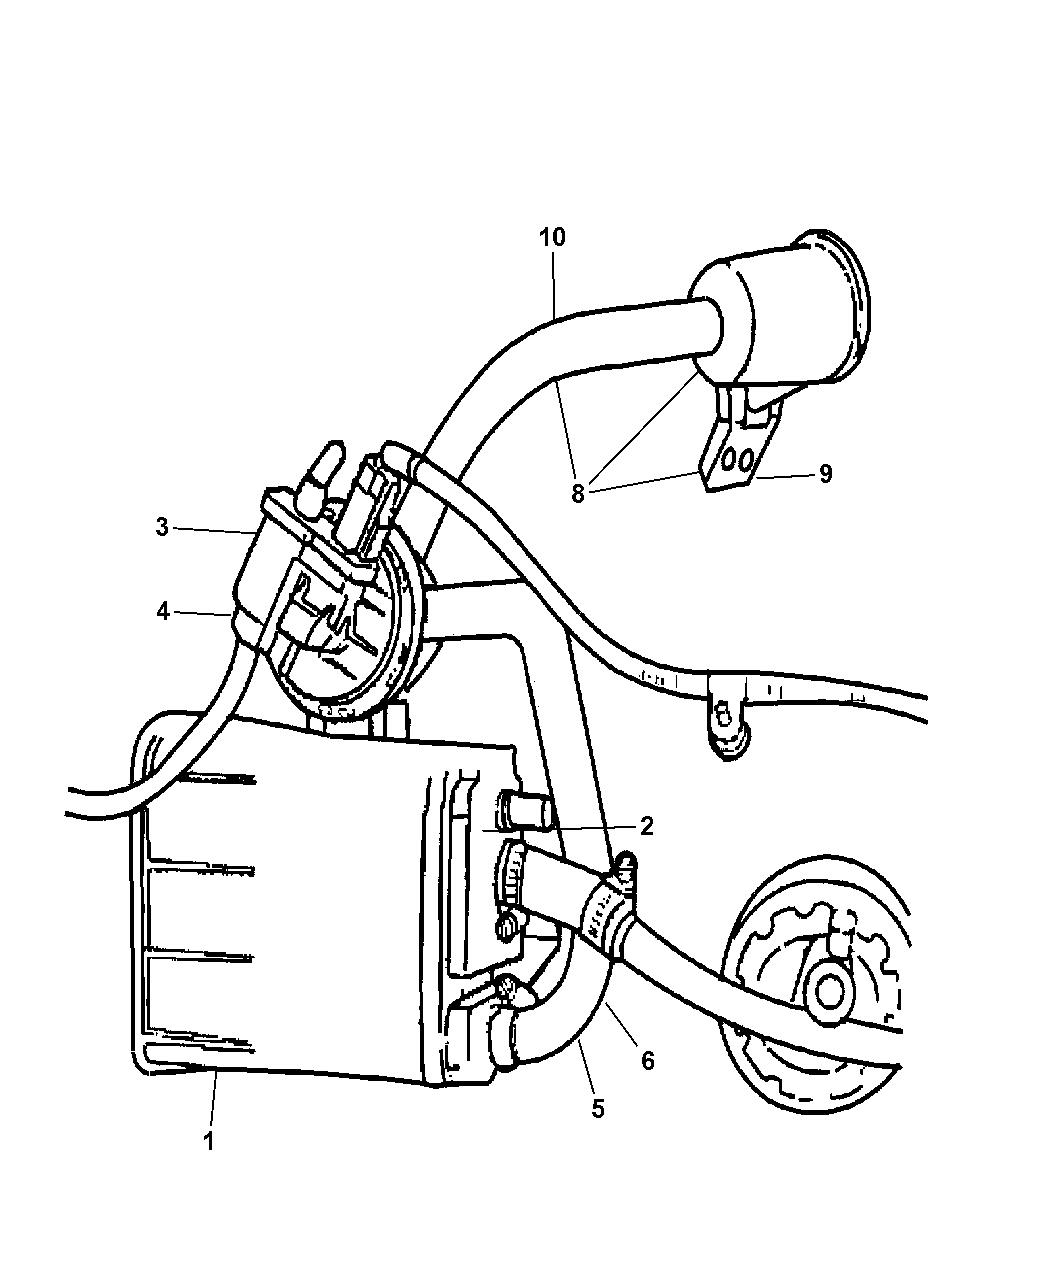 2004 dodge stratus sedan vacuum canister  u0026 leak detection pump